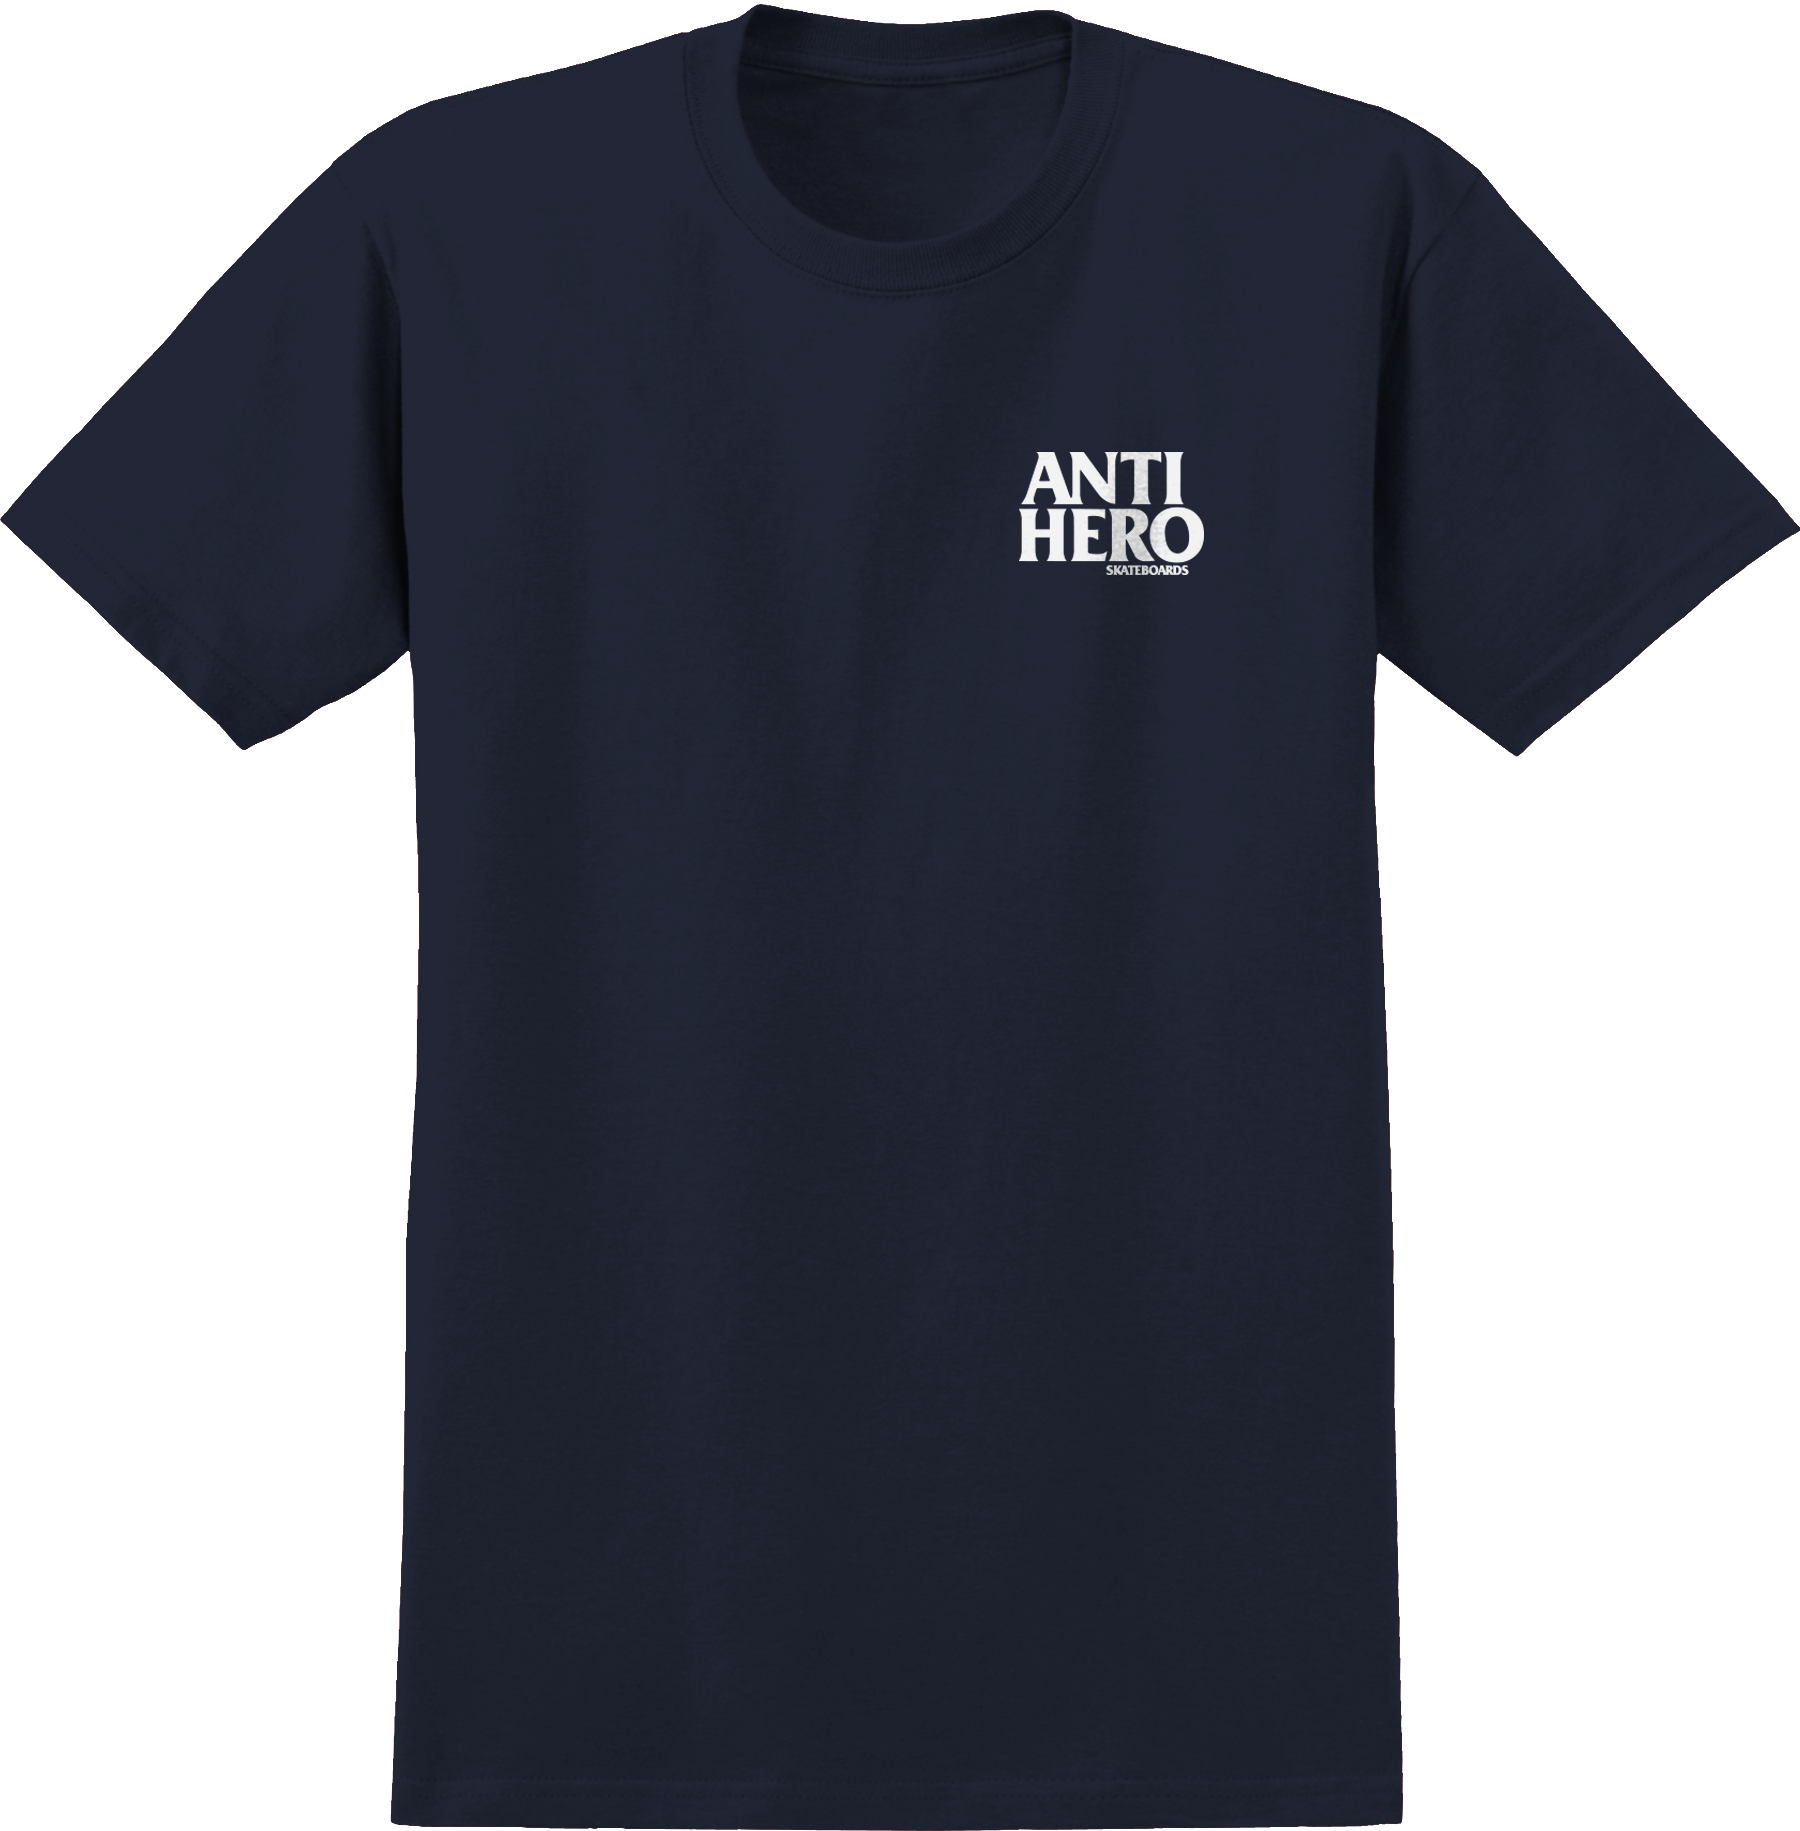 Anti Hero Lil Blackhero Navy/White